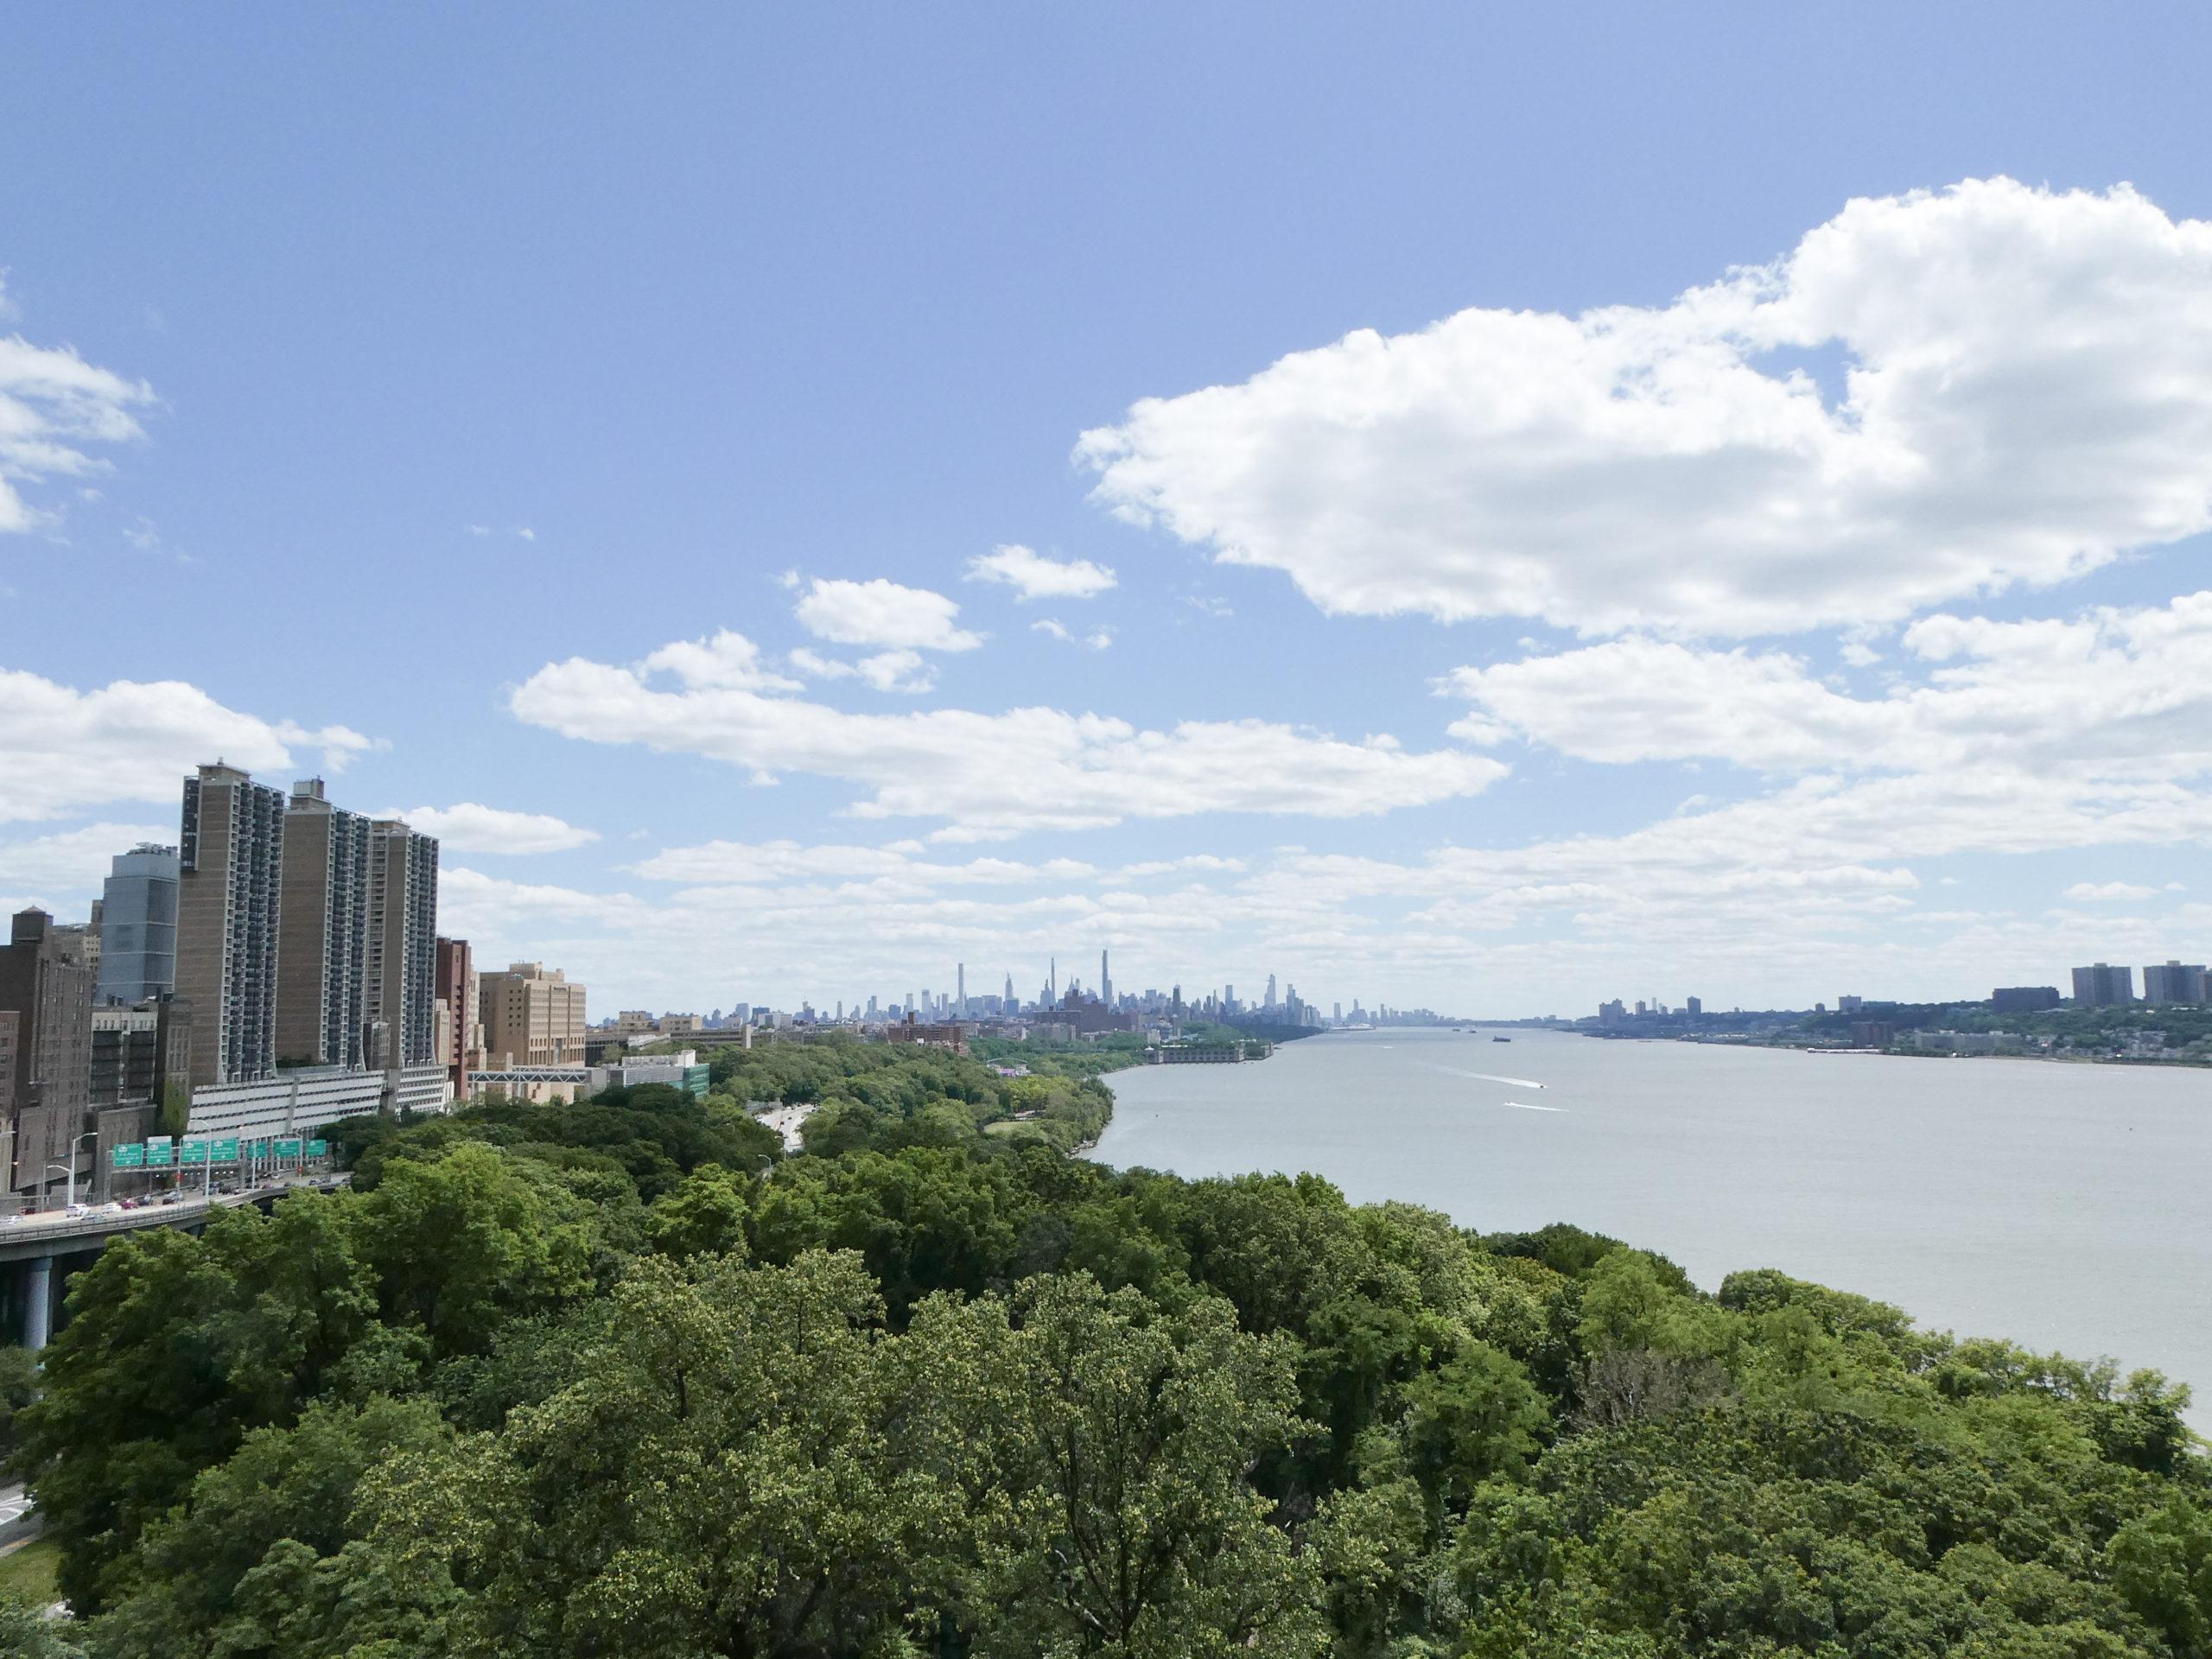 View of Manhattan from the George Washington Bridge